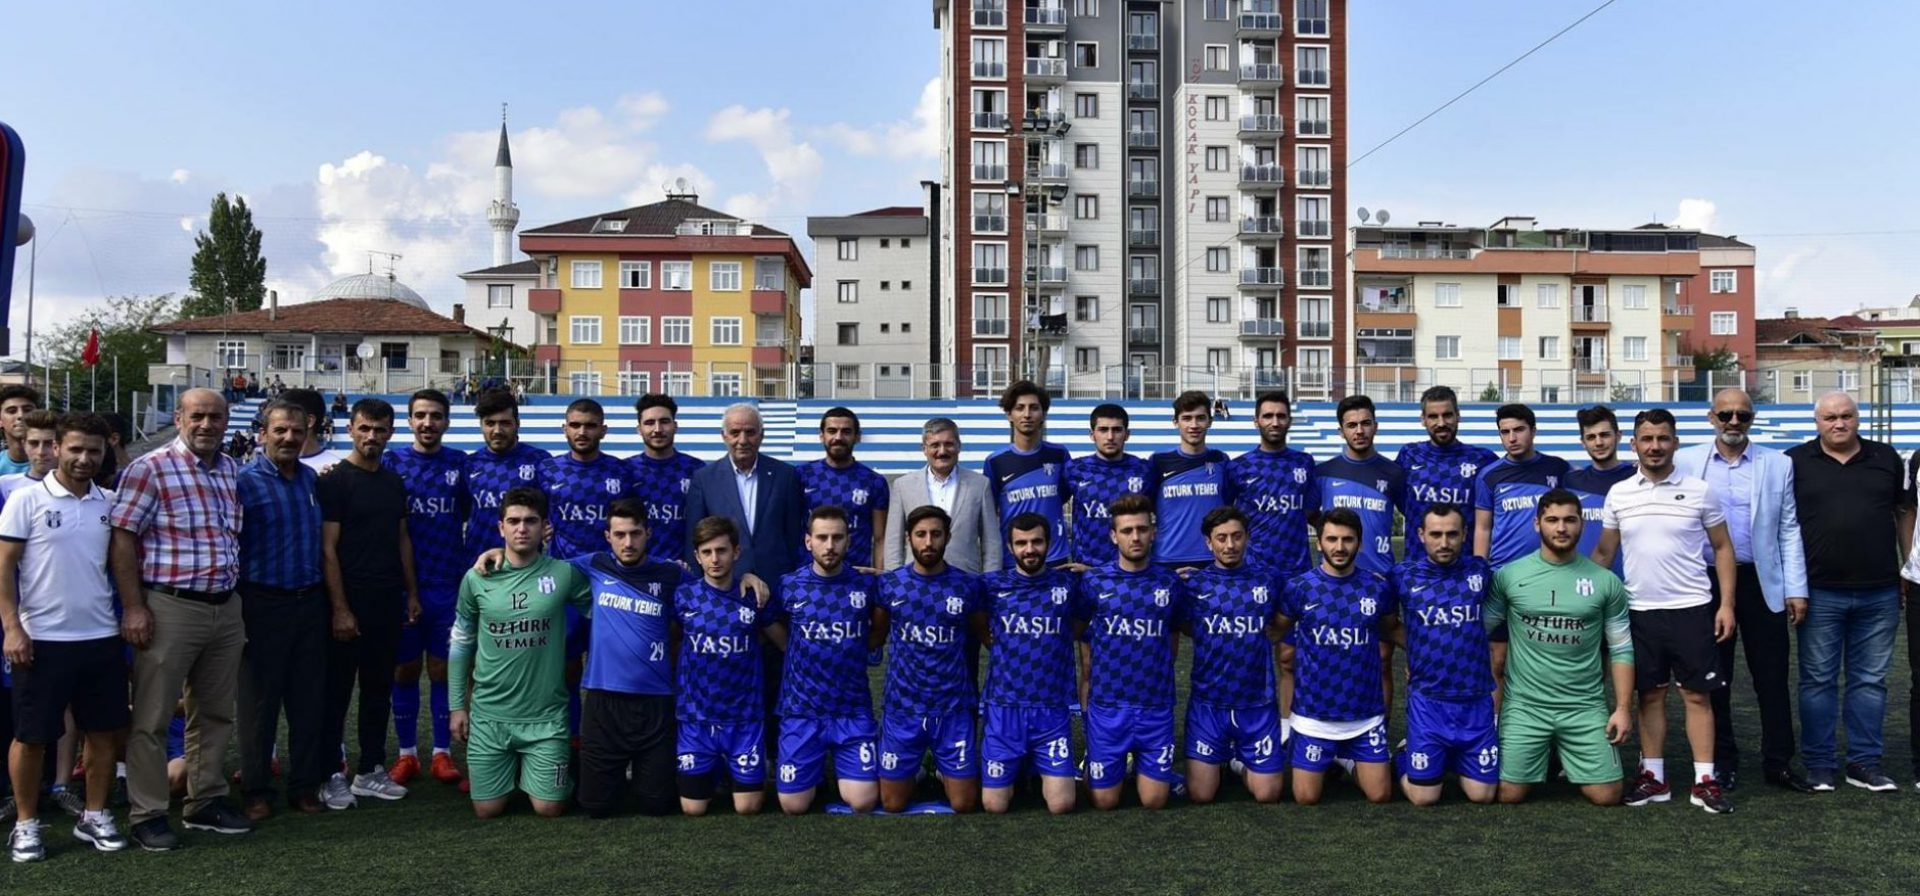 Kaynarca Spor Kulübü